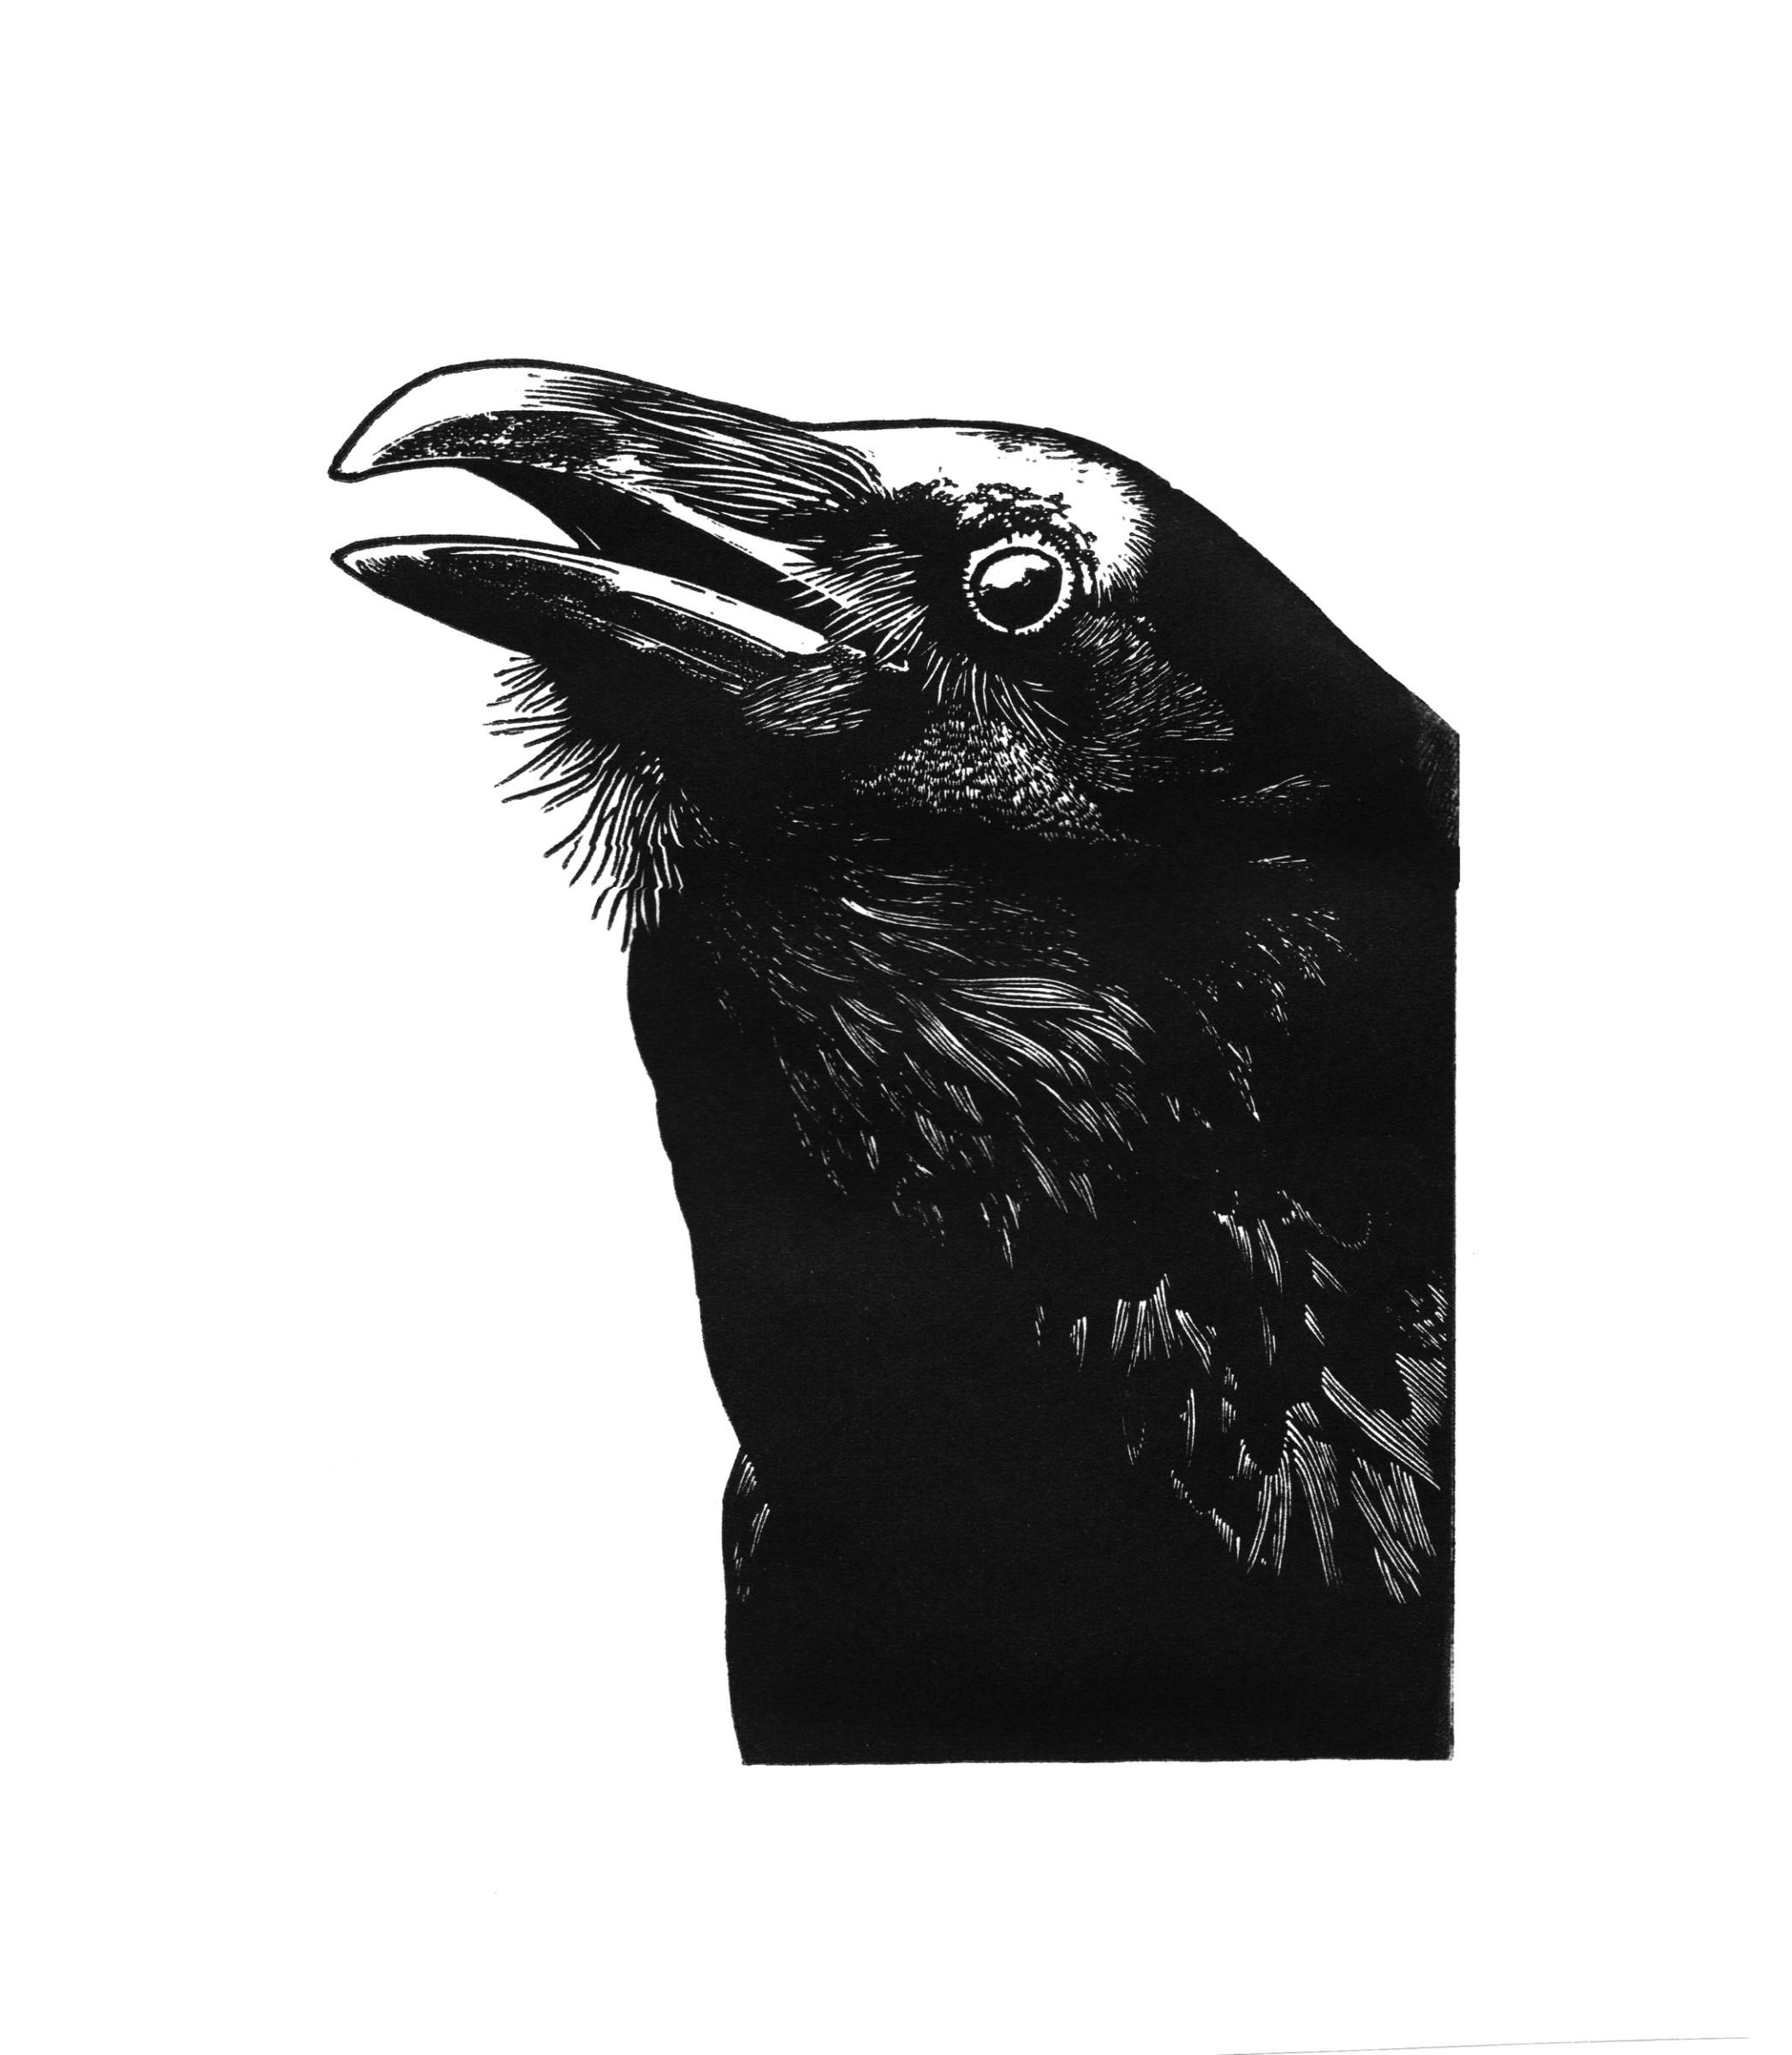 "<span class=""link fancybox-details-link""><a href=""/exhibitions/23/works/artworks_standalone11183/"">View Detail Page</a></span><div class=""artist""><span class=""artist""><strong>Blaze Cyan RE</strong></span></div><div class=""title""><em>Quoth the Raven 'Nevermore'</em></div><div class=""medium"">wood engraving</div><div class=""dimensions"">22 x 17cm paper size<br>12 x 9cm image size</div><div class=""edition_details"">edition of 100</div>"